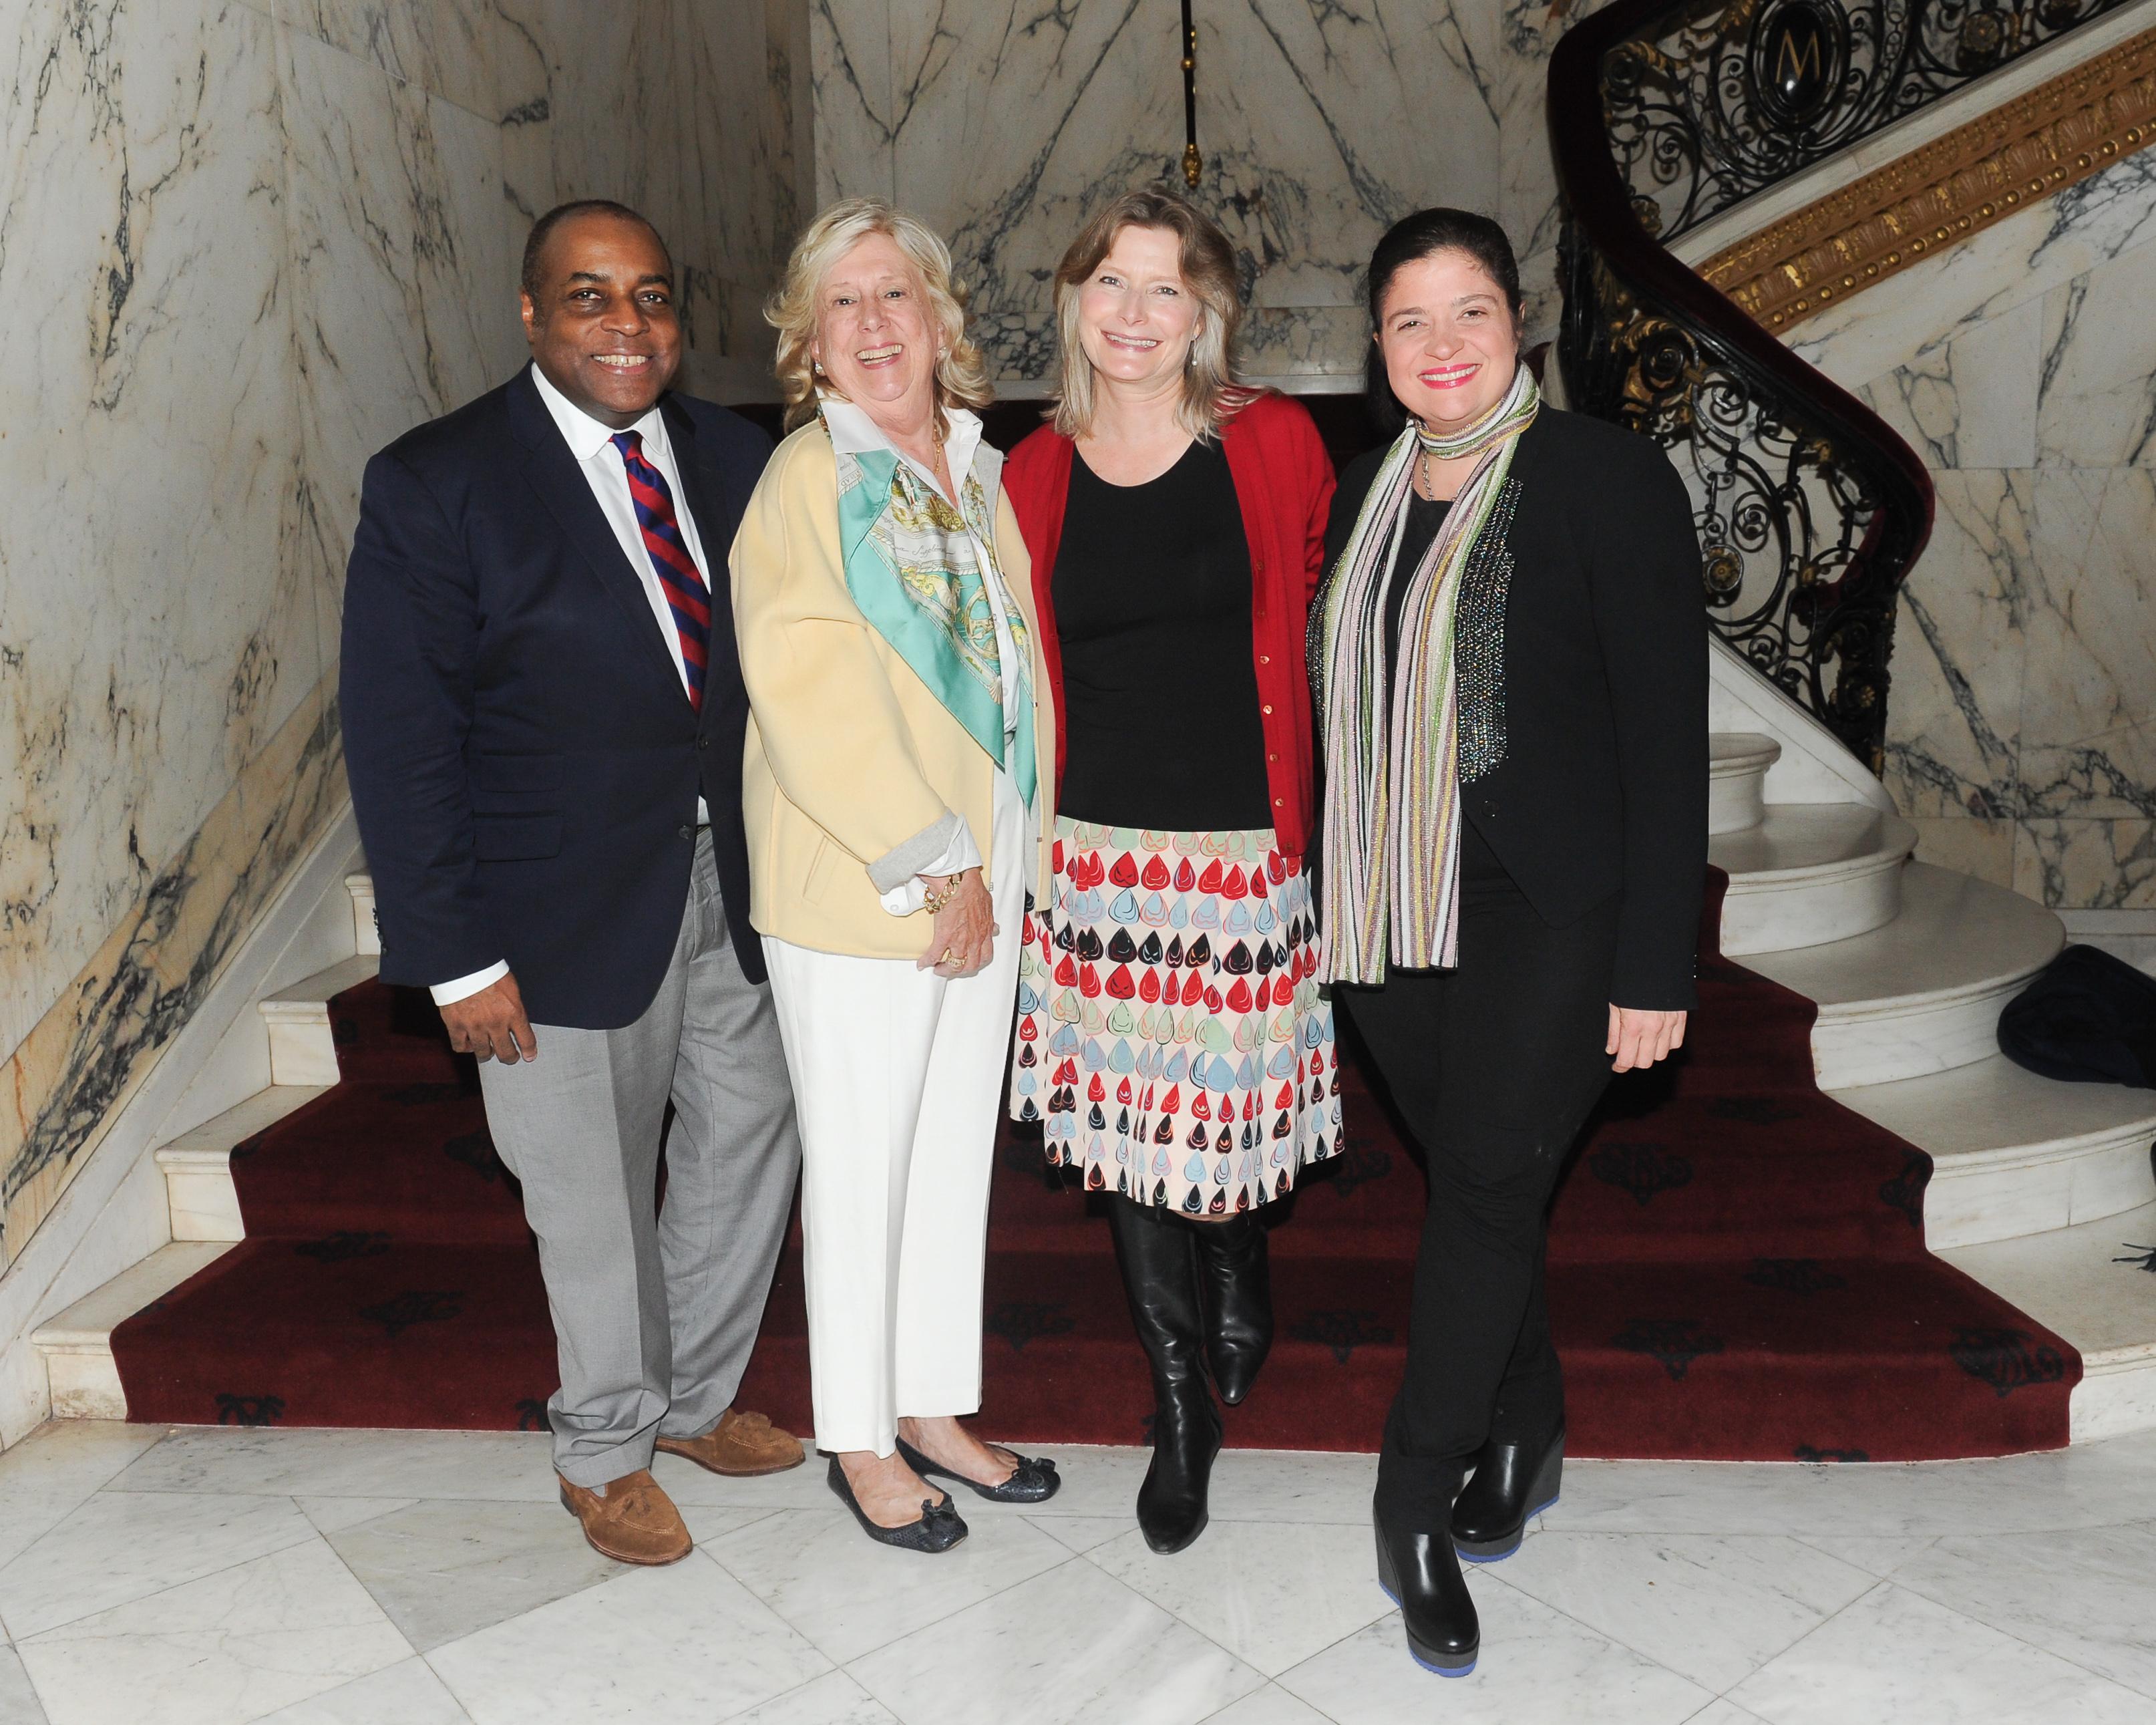 Jeffrey Banks, Linda Fairstein, Jennifer Egan and Alex Guarnaschelli at the Metropolitan Club.